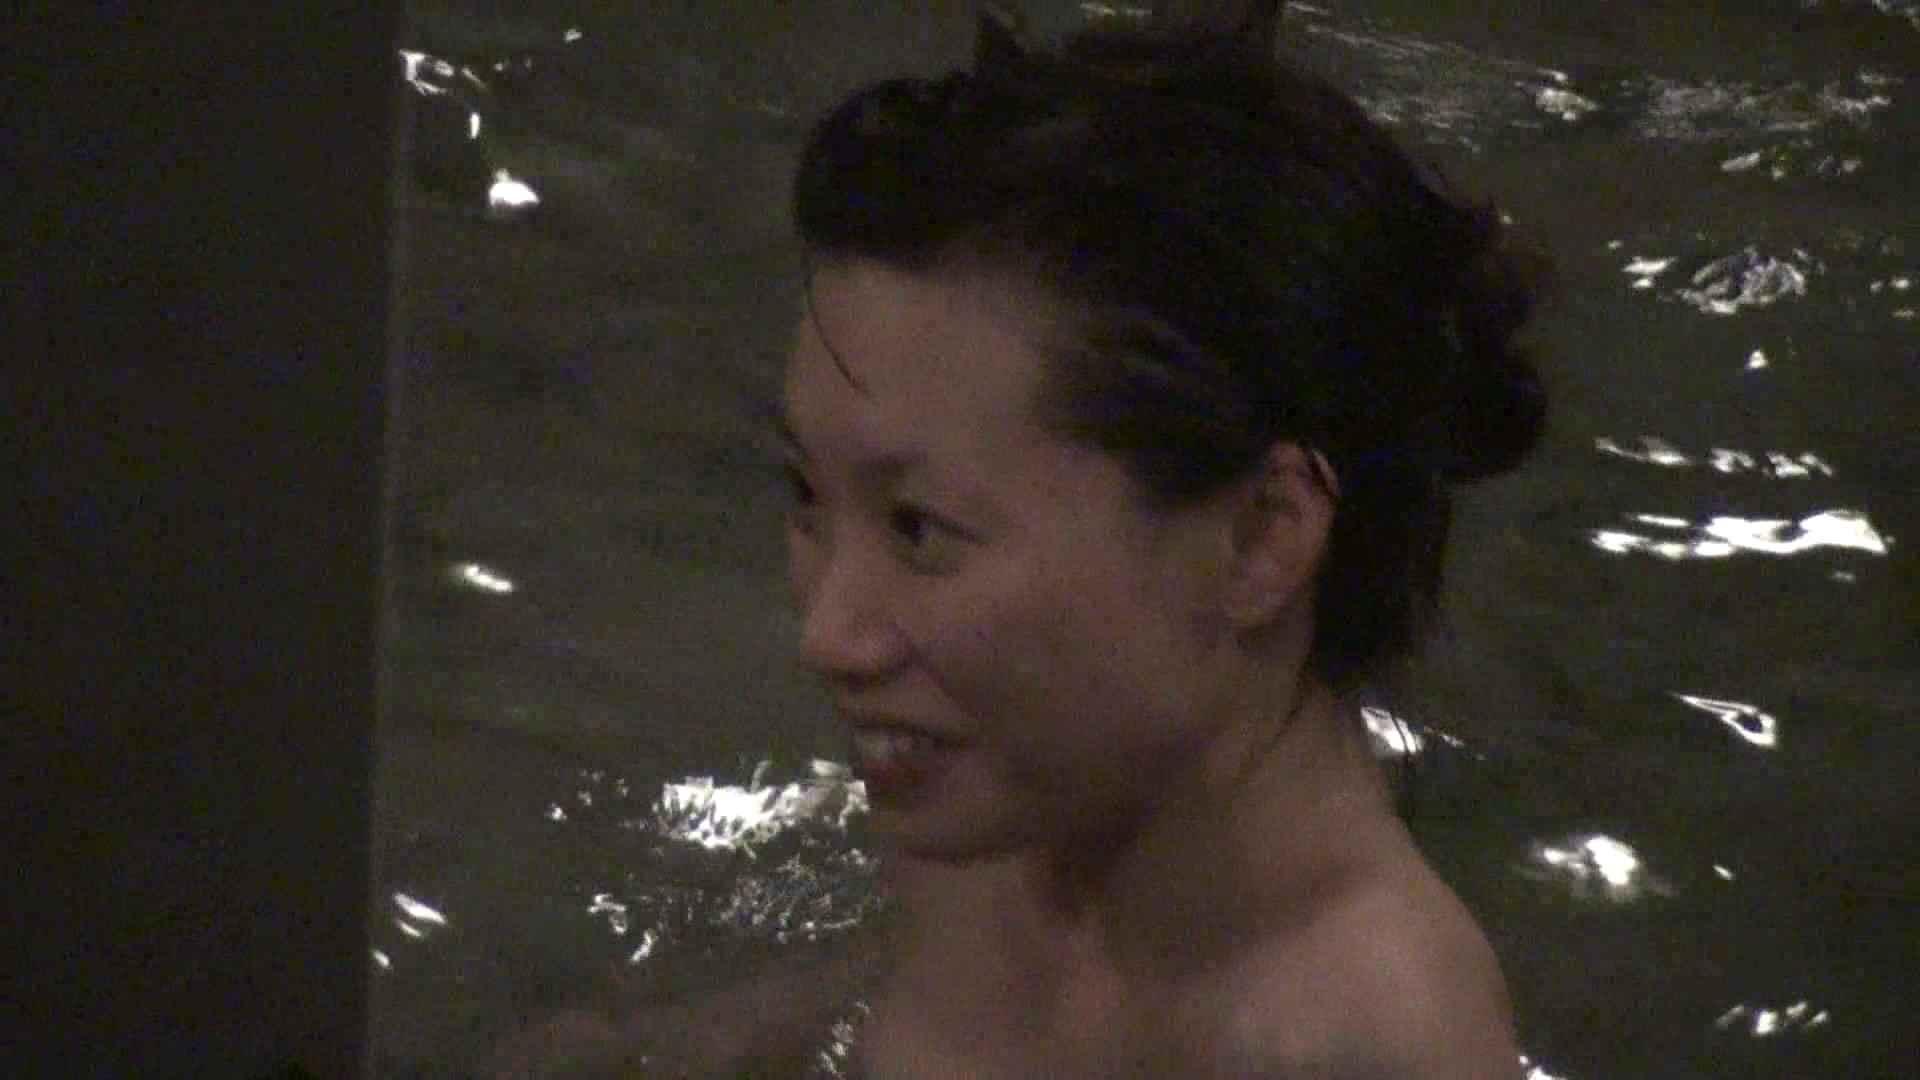 Aquaな露天風呂Vol.429 露天風呂編  111PIX 74